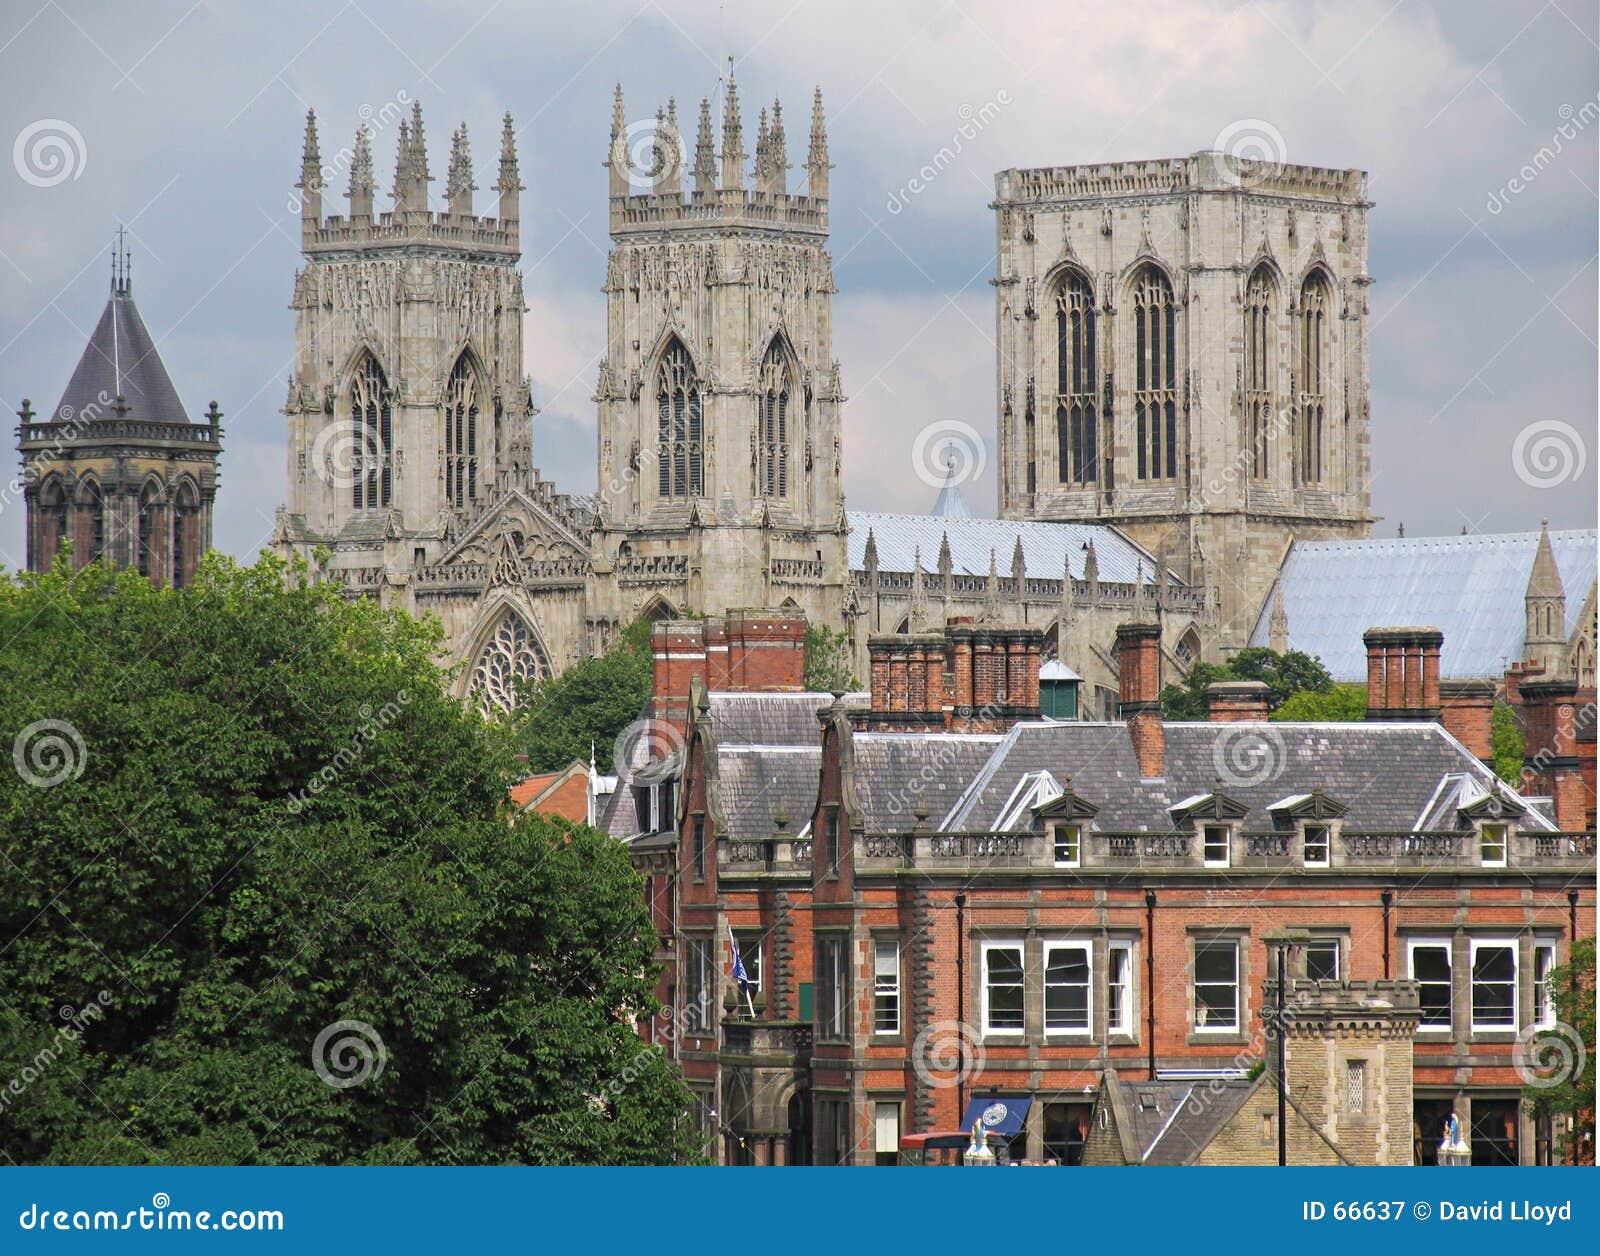 Cathédrale de York Minster